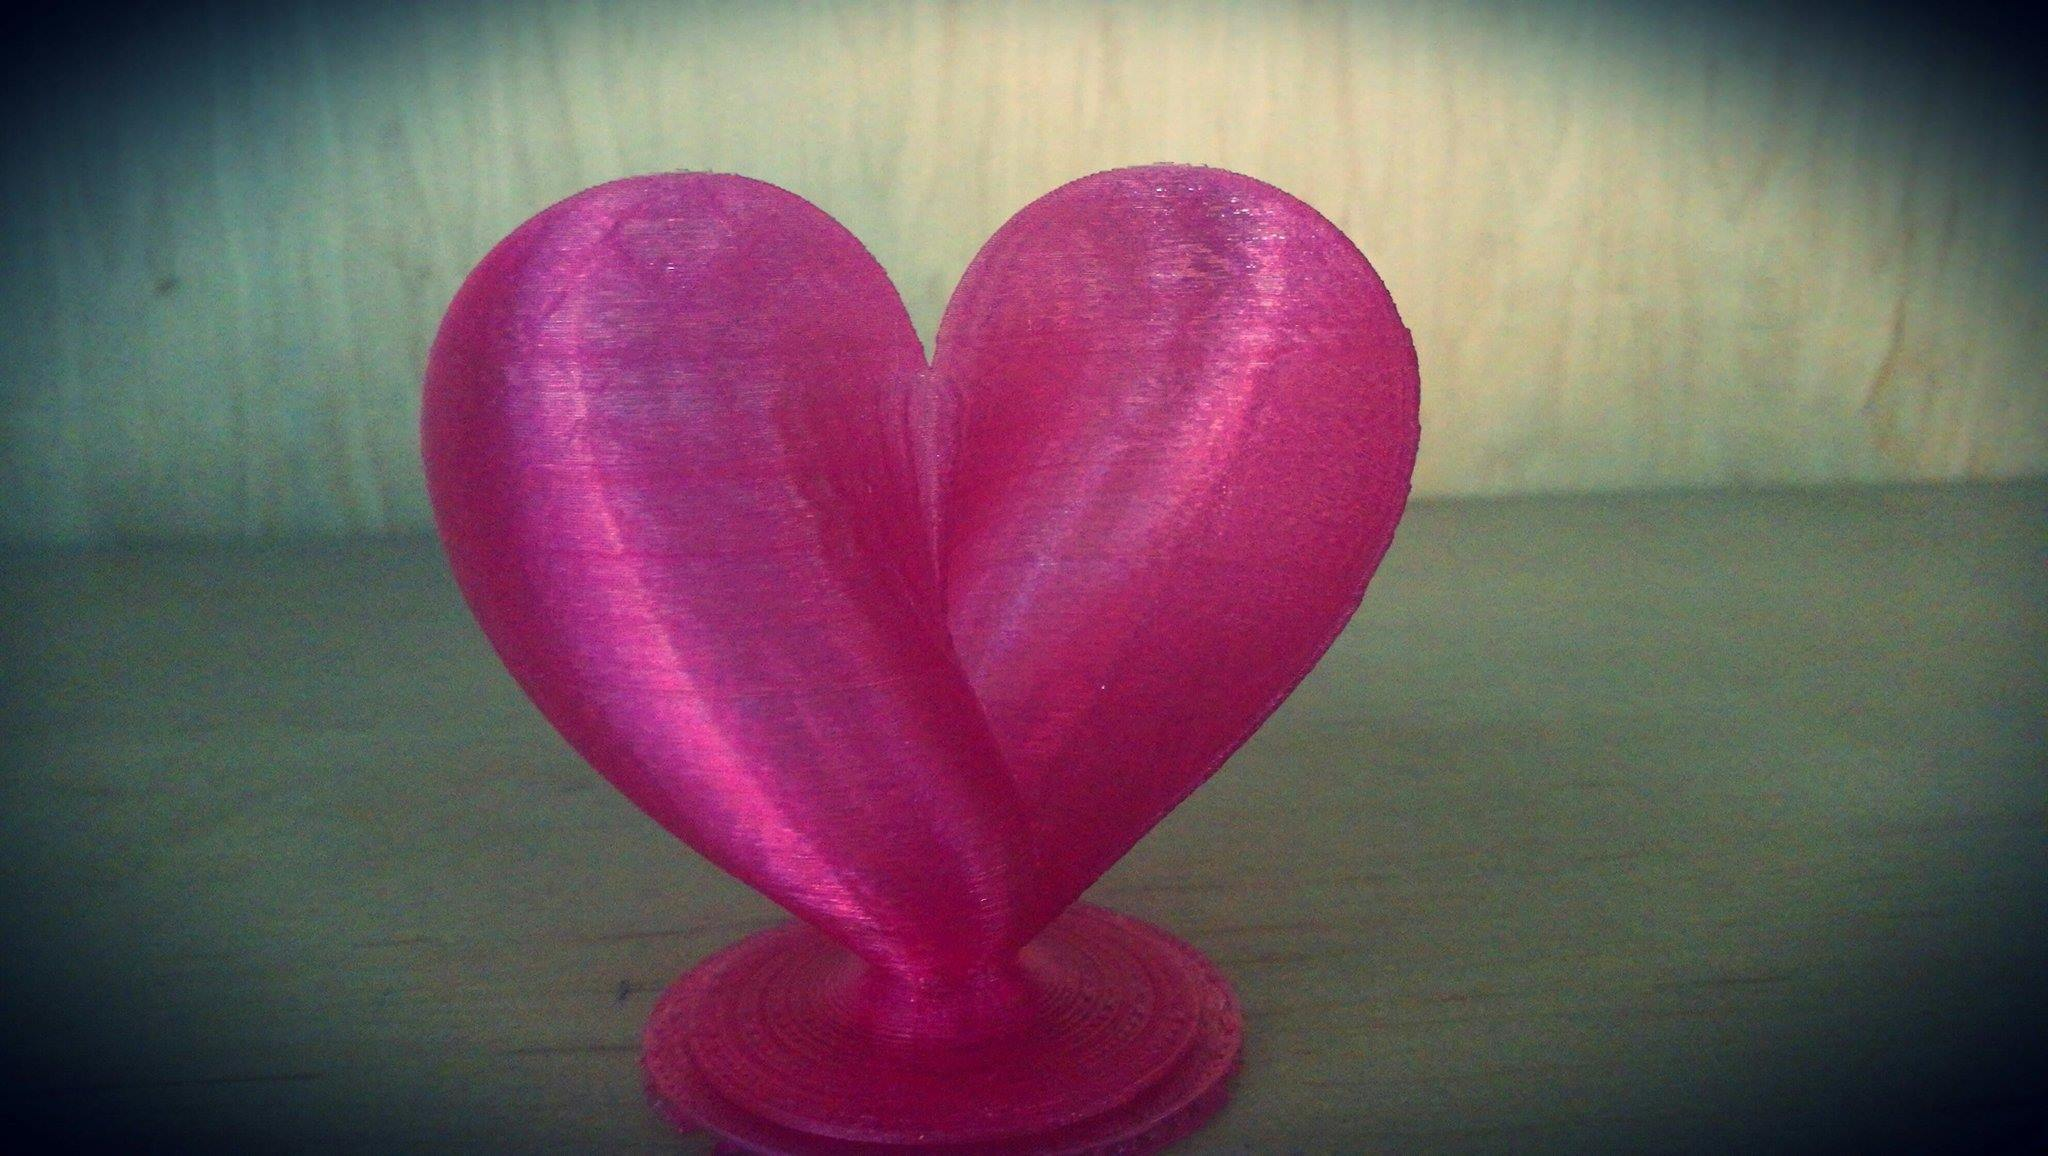 16805409_1328378217227172_184668841_o.jpg Download free STL file Heart  • 3D printing template, MakePrintable